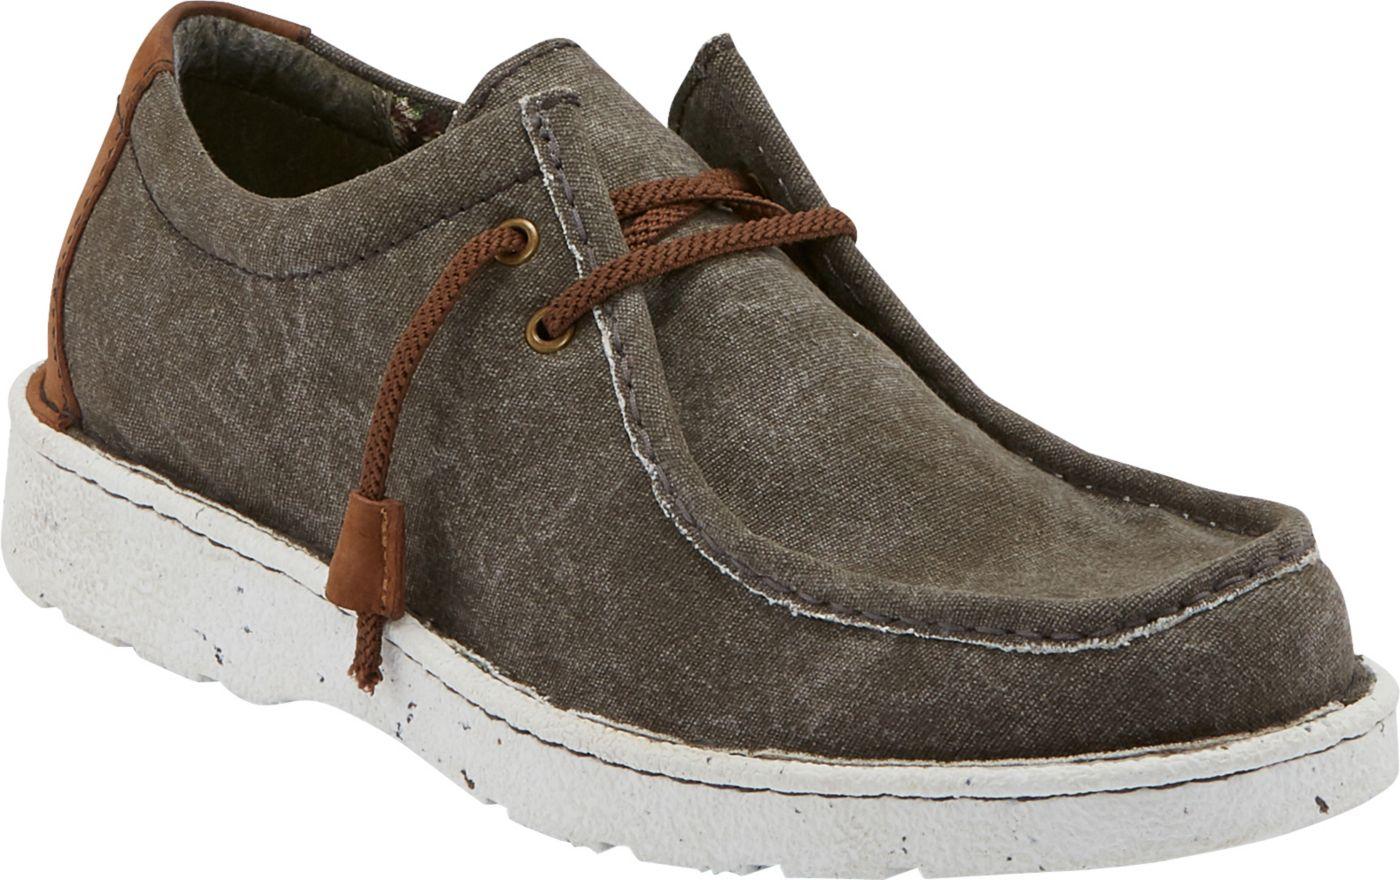 Justin Men's Hazer Casual Shoes